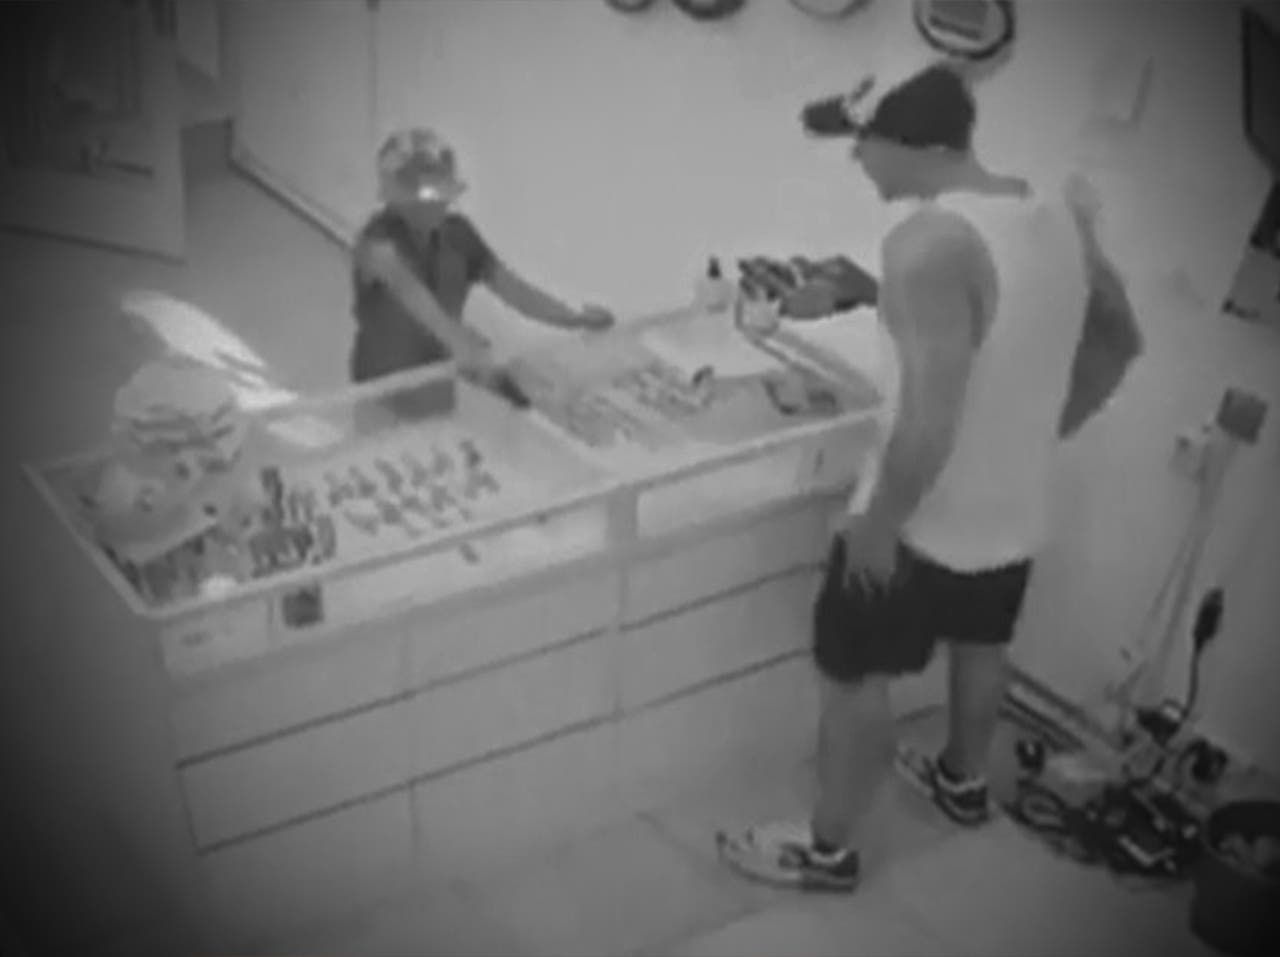 Niño con pistola intenta robar en joyería